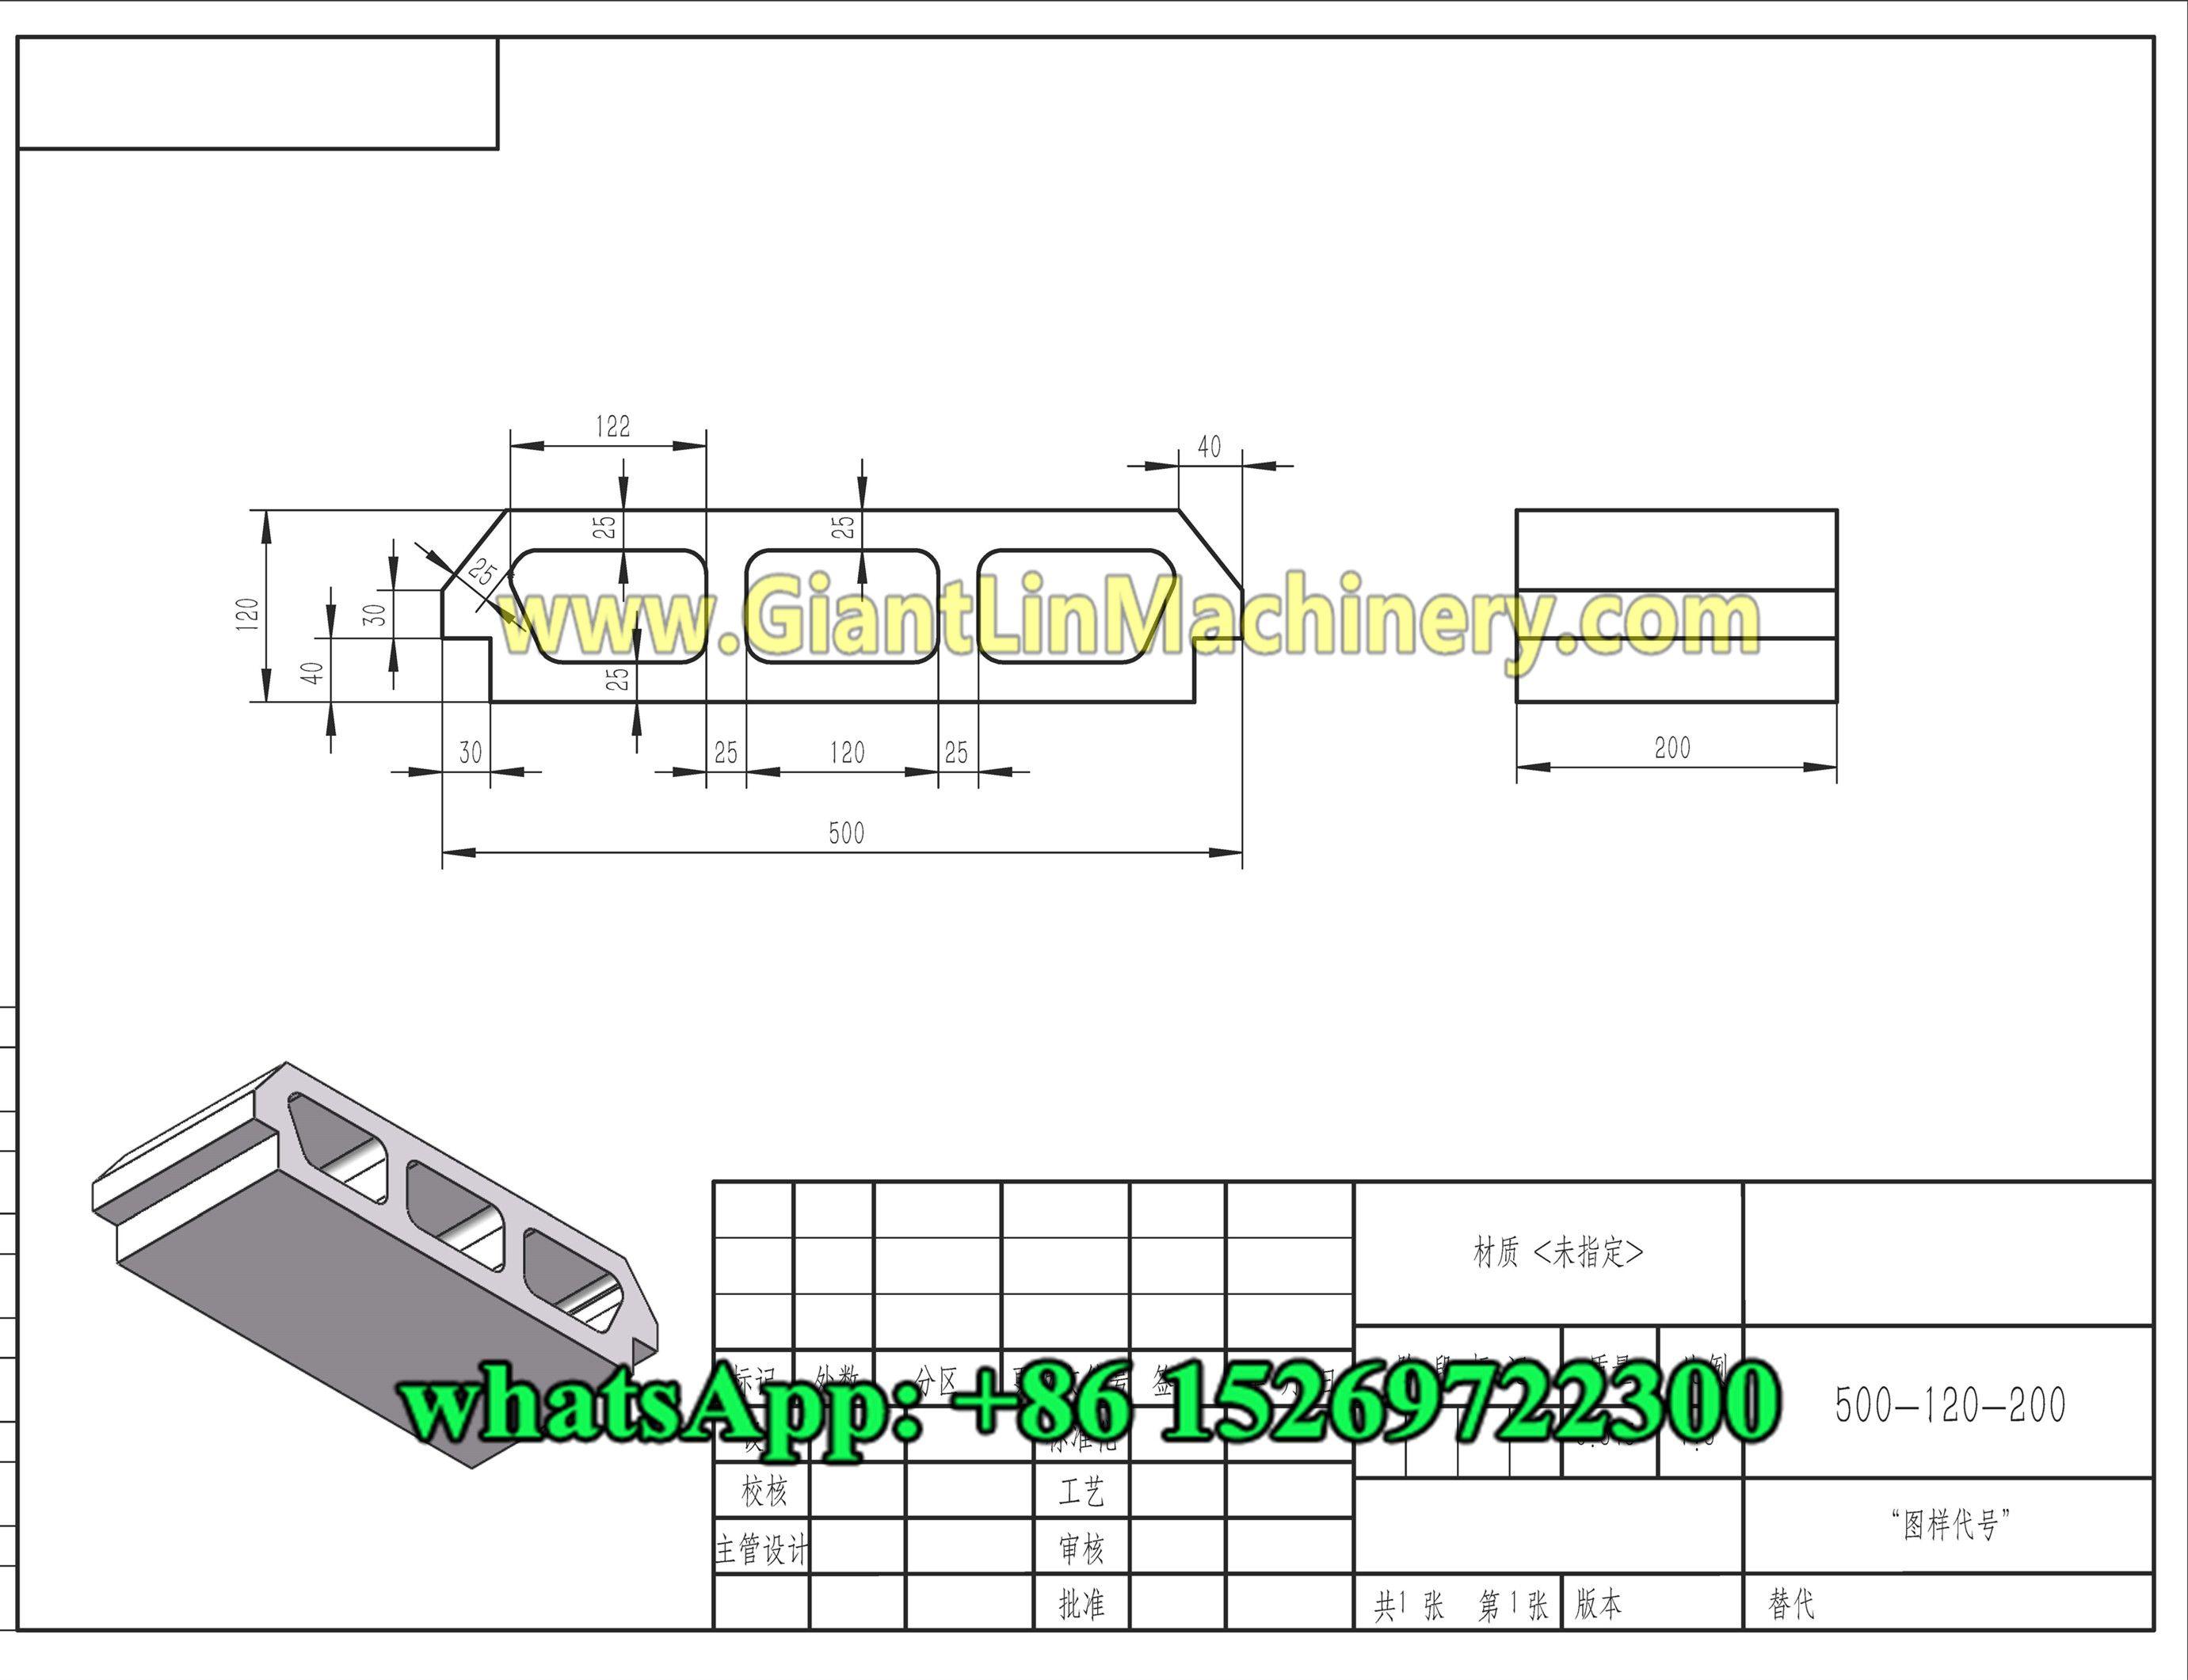 Concrete Hourdis Drawings Size 500 120 200mm Algeria Ghana And Tanzania Hourdis Block Size Design Concrete Blocks Paver Designs Metal Words